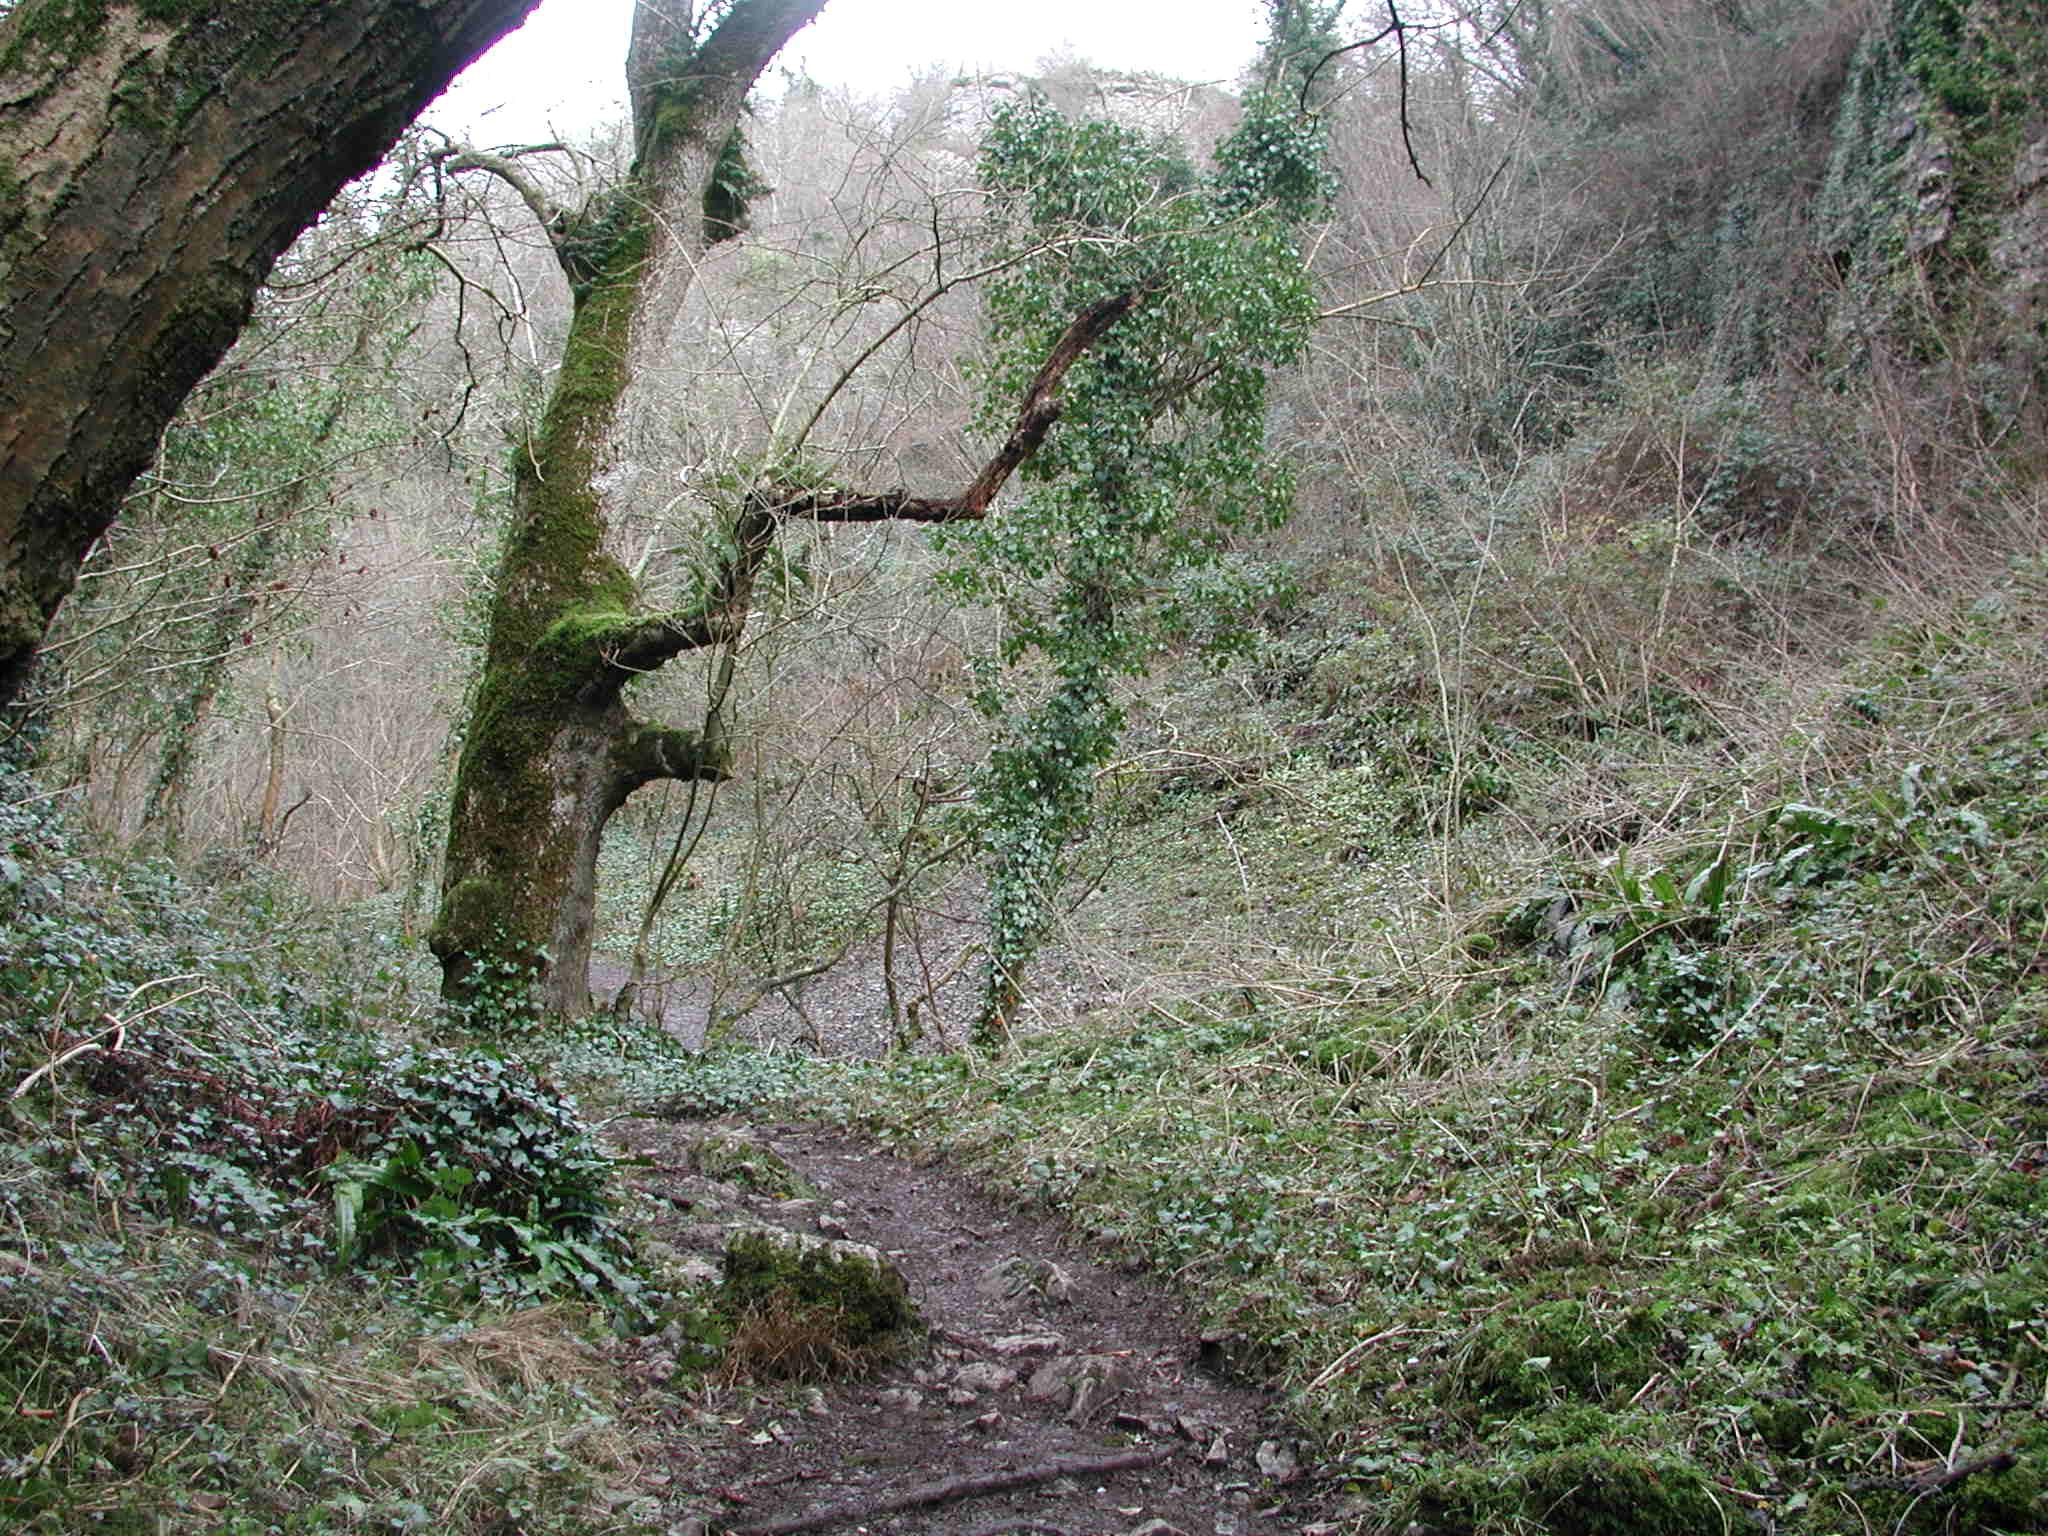 The woodland path into Ebbor Gorge.